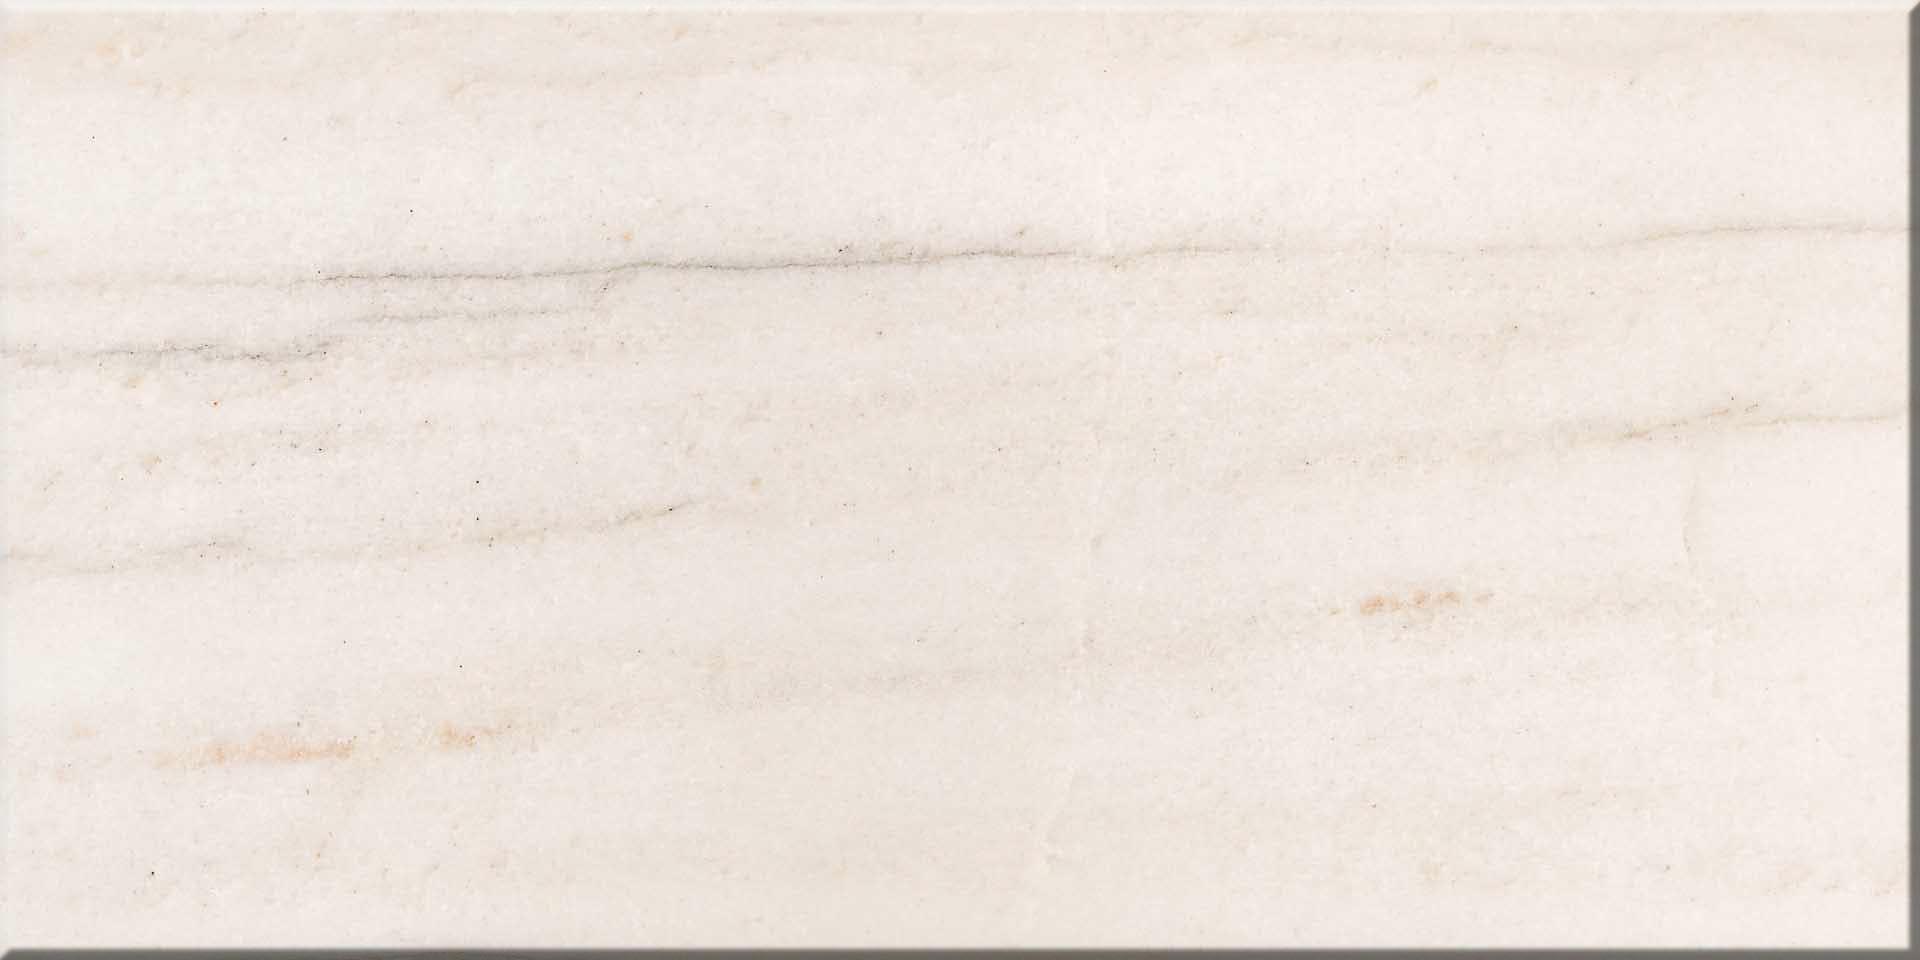 Sensa Granite Worktops New Light Materials For The